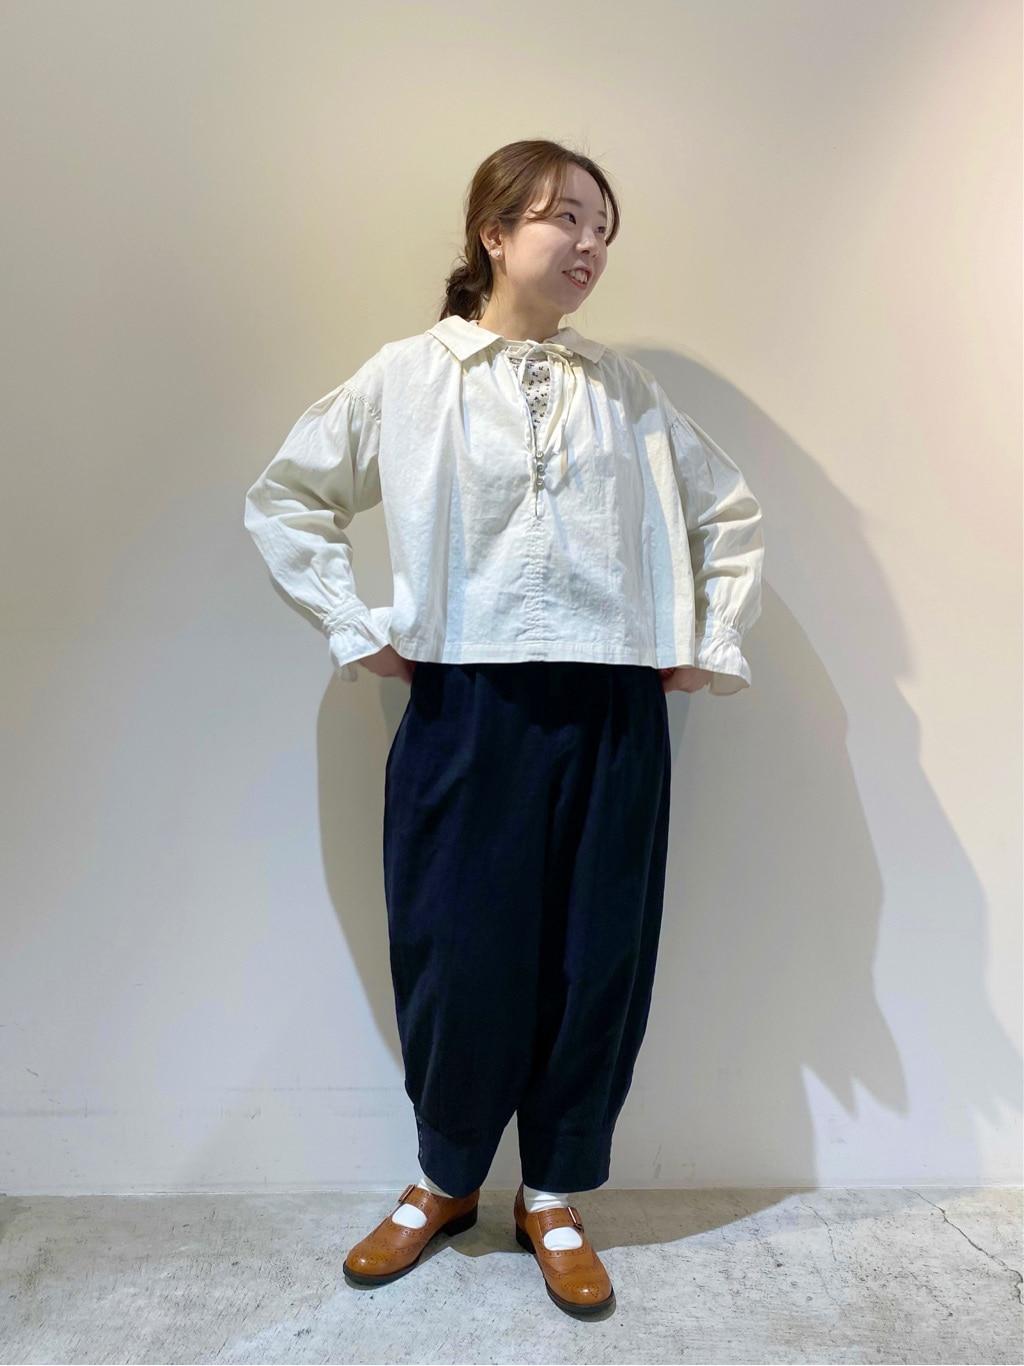 chambre de charme 京都路面 身長:155cm 2021.01.27